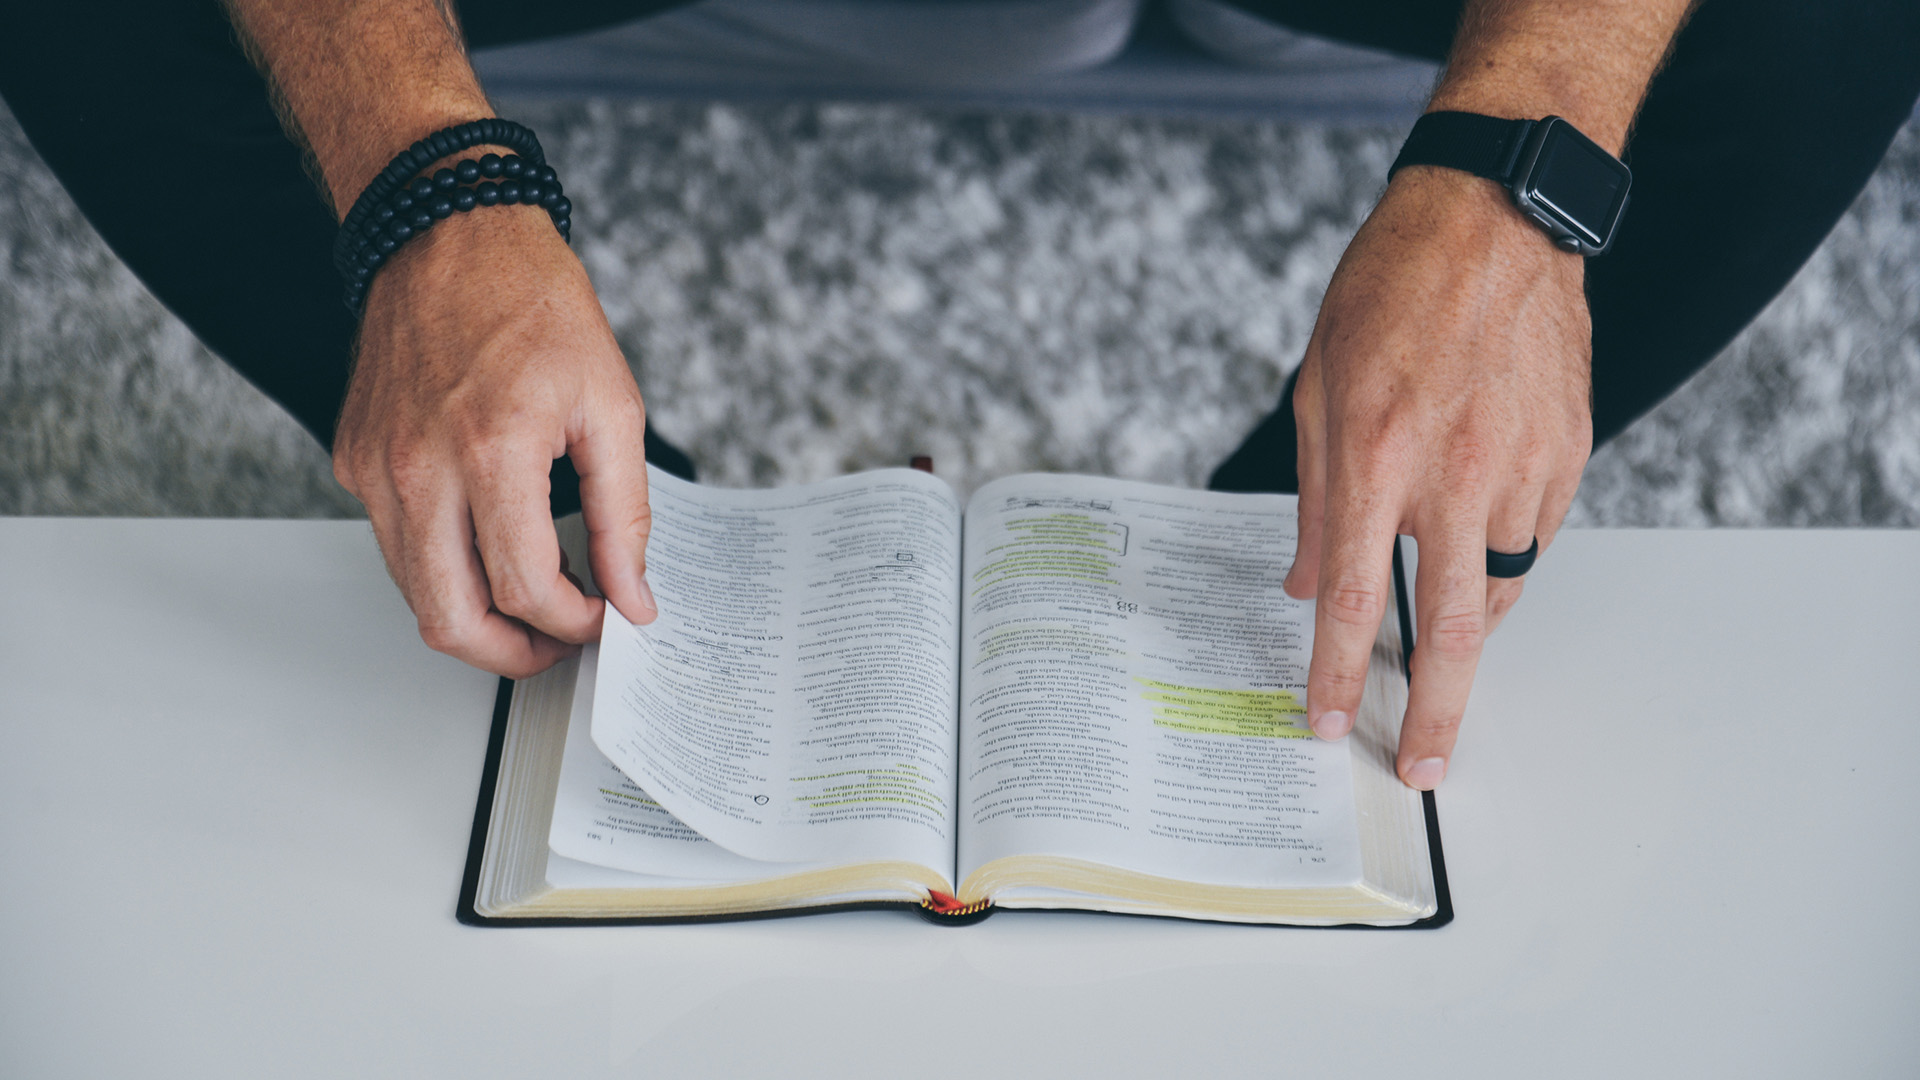 Robin Schumacher on The Saddest Verse in the Bible